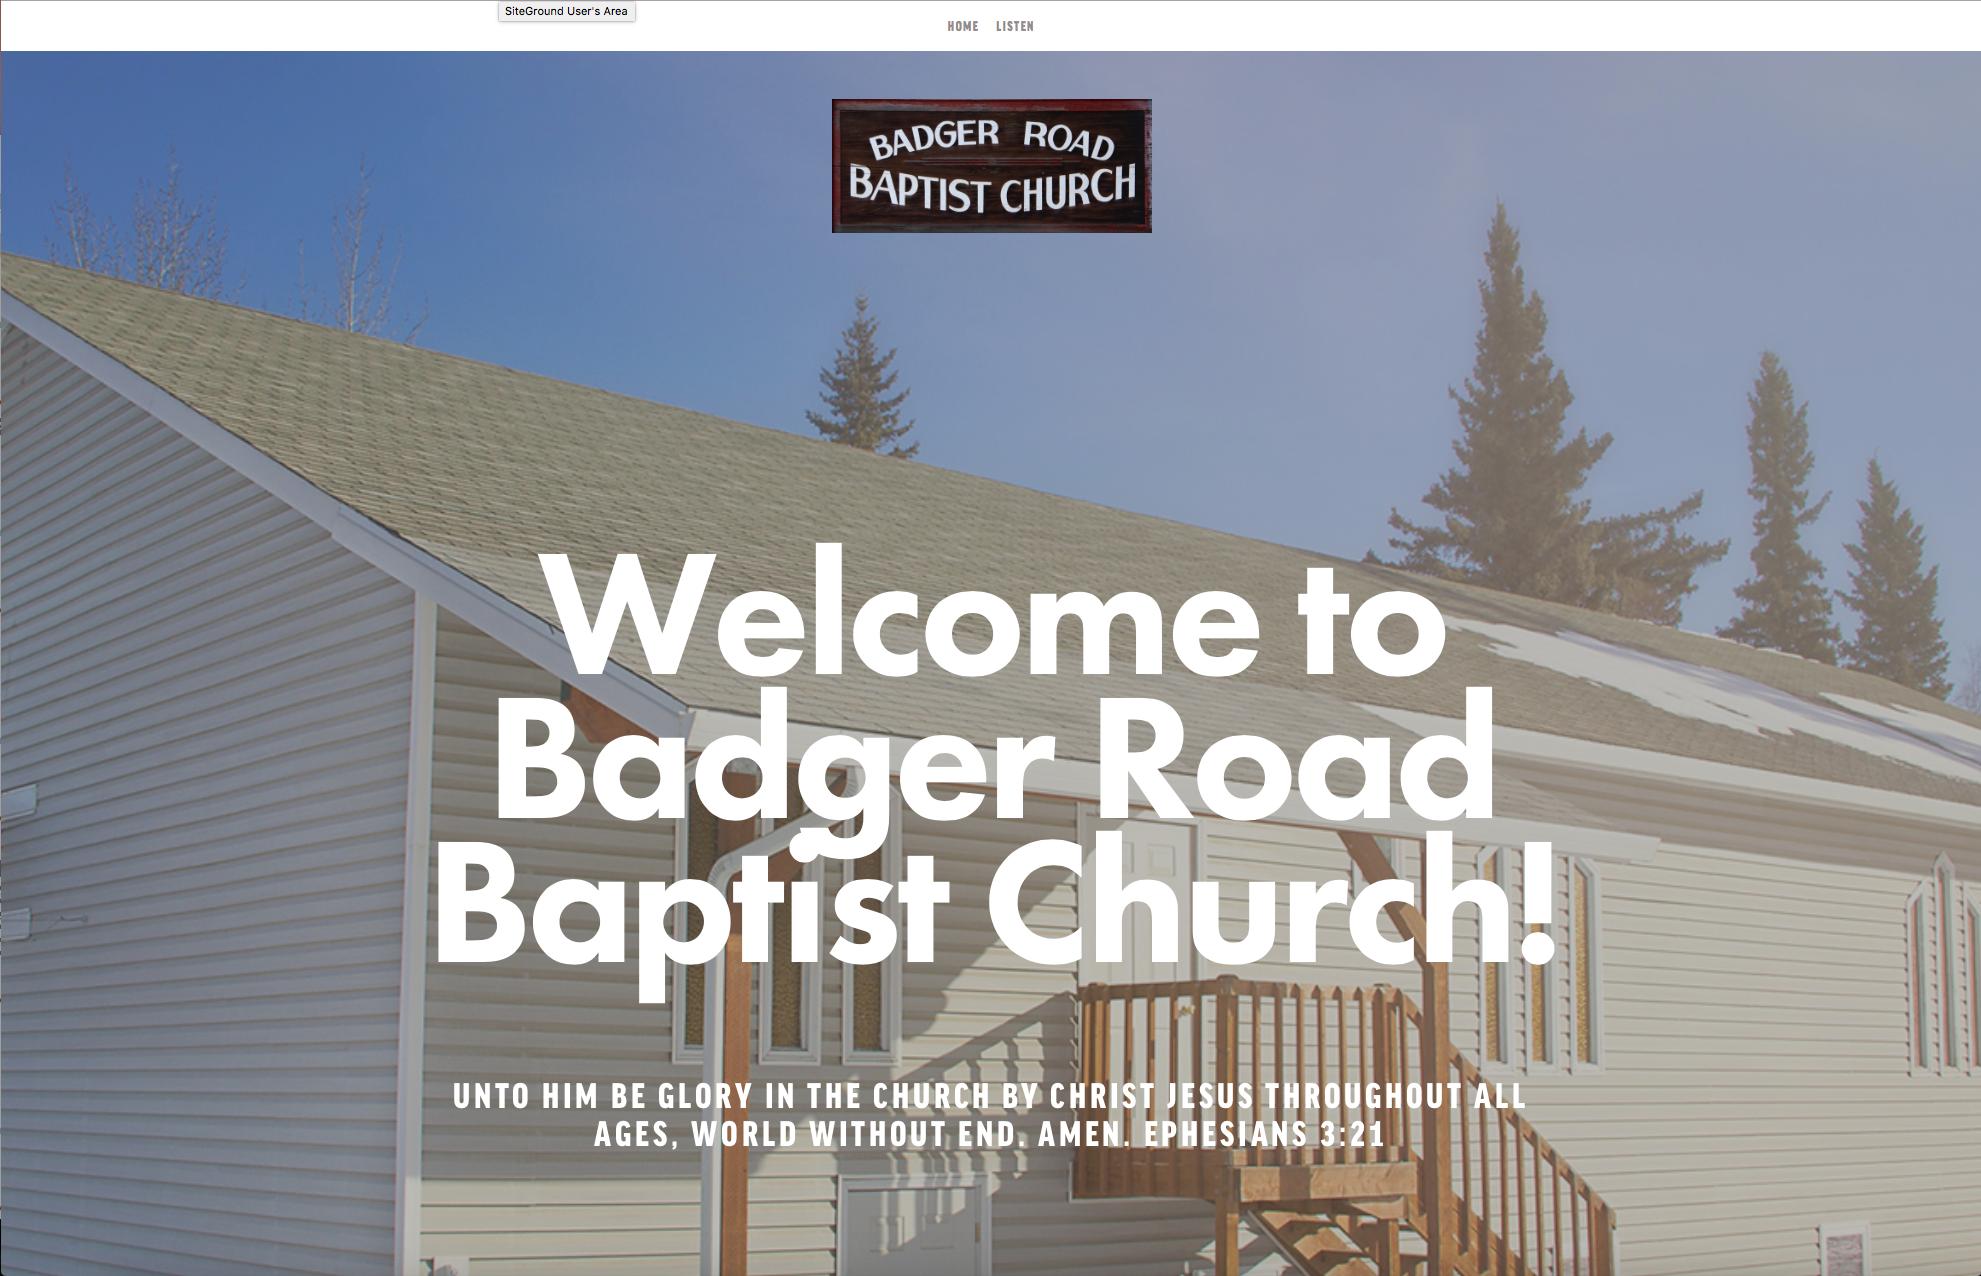 Badger Road Baptist Church